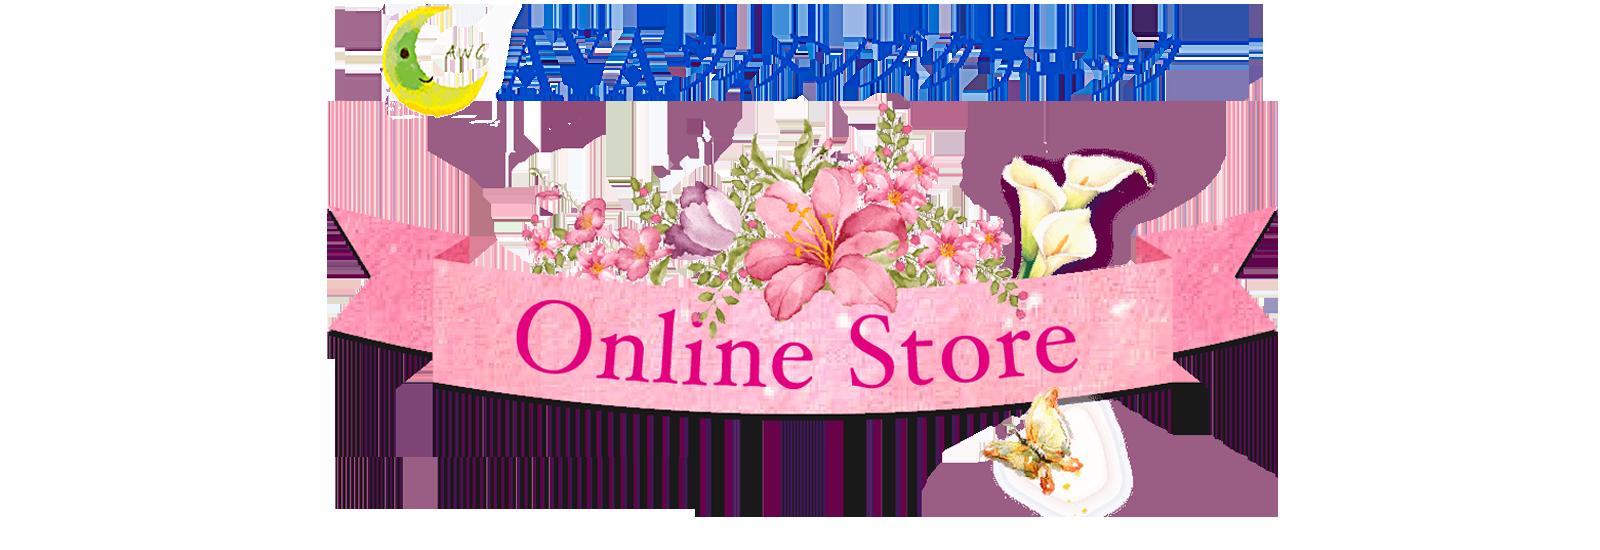 AYA ウィメンズクリニック Online Store